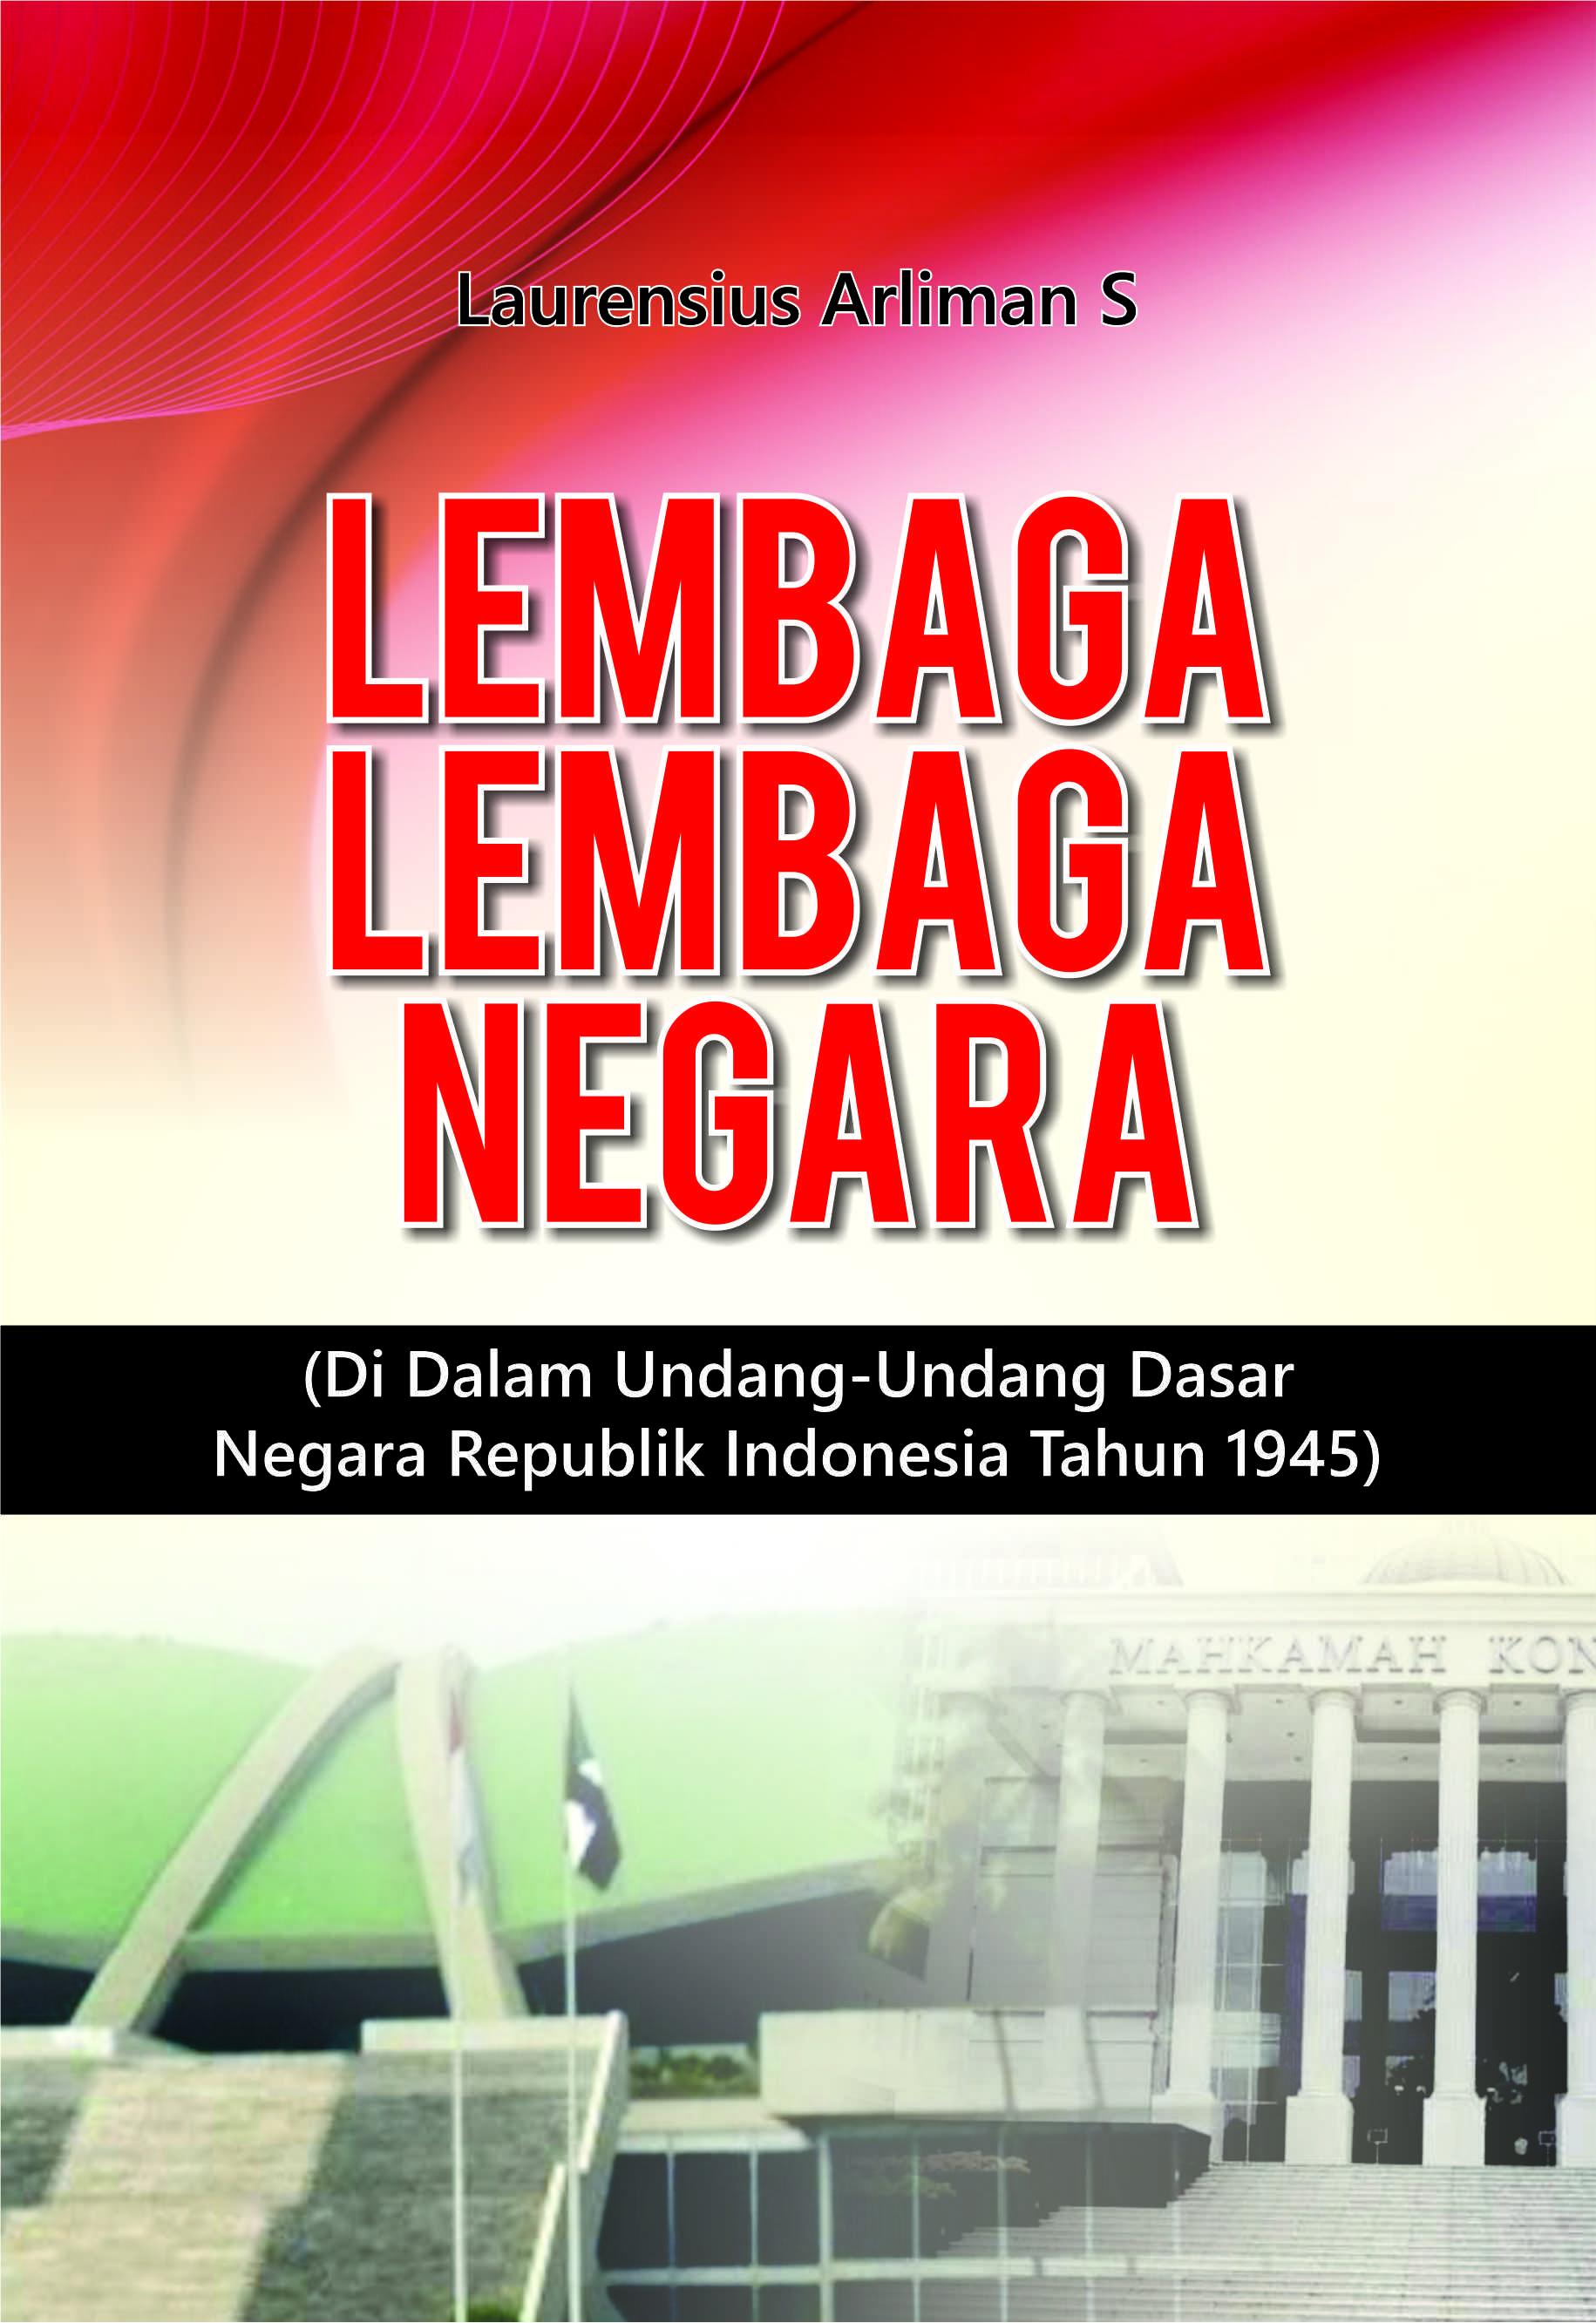 Lembaga-lembaga negara di dalam Undang-Undang Dasar Negara Republik Indonesia tahun 1945 [sumber elektronis]